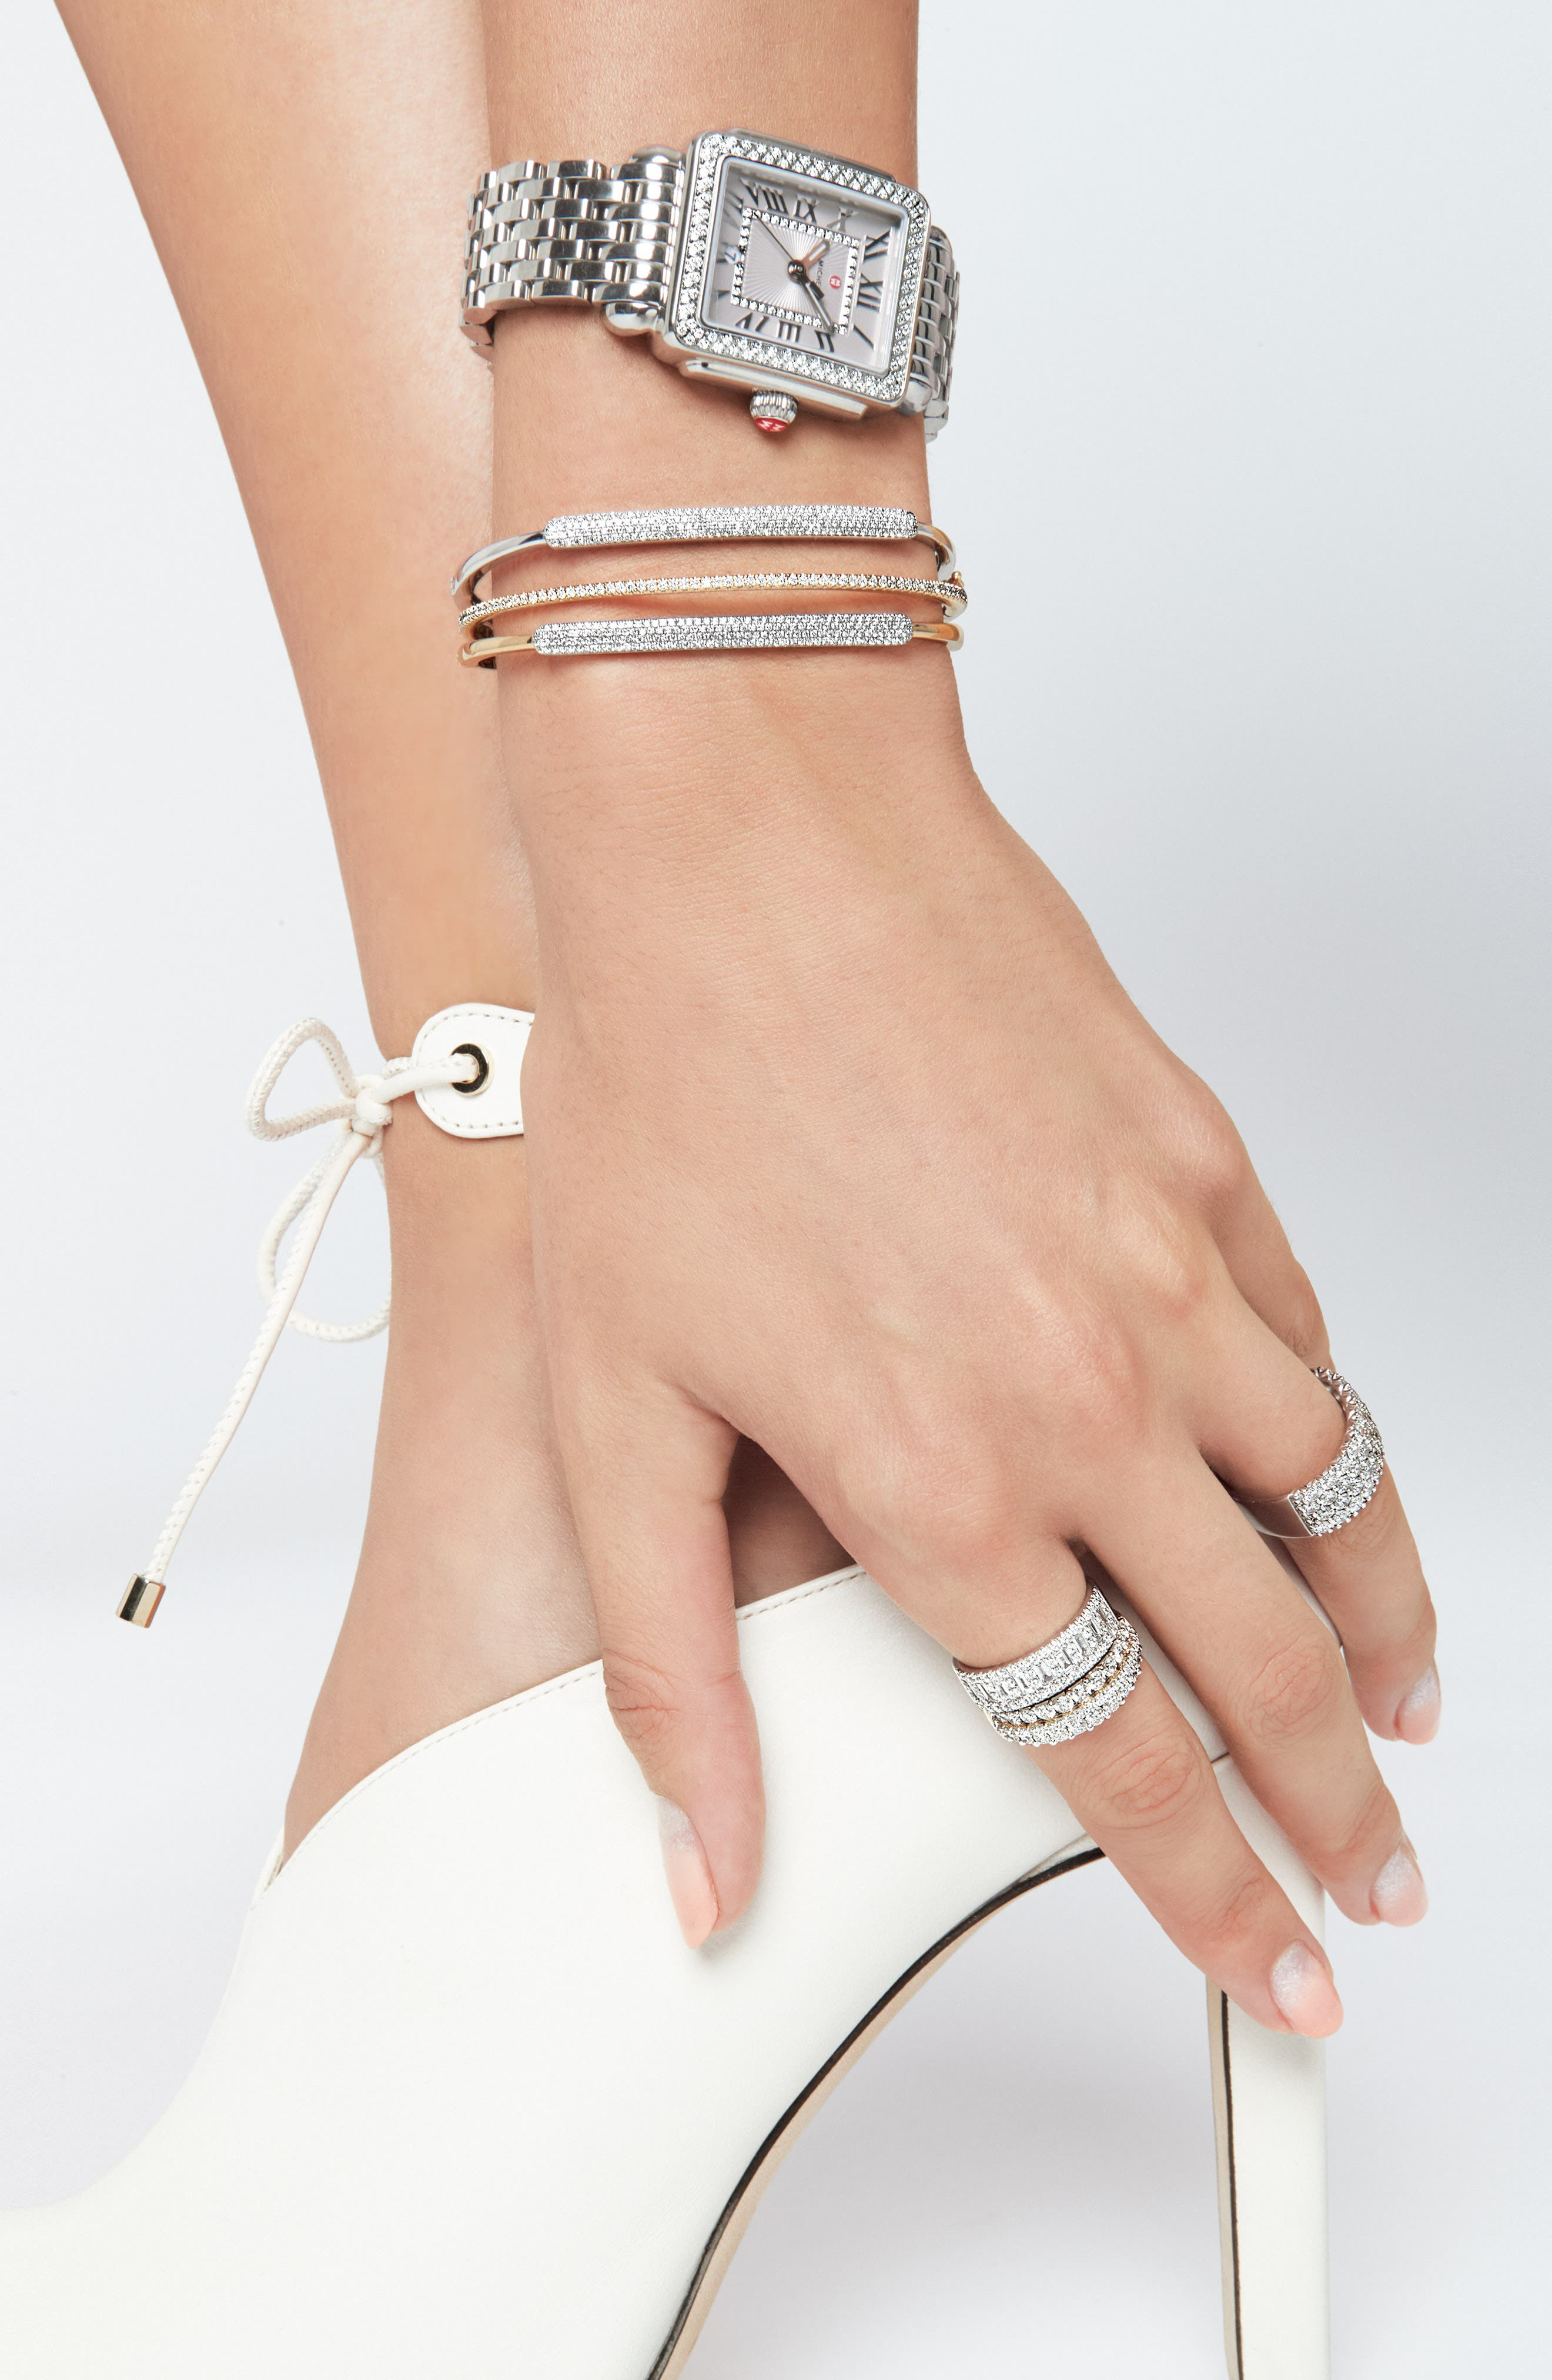 Deco 16 16mm Gold Plated Bracelet Watchband,                             Alternate thumbnail 6, color,                             GOLD